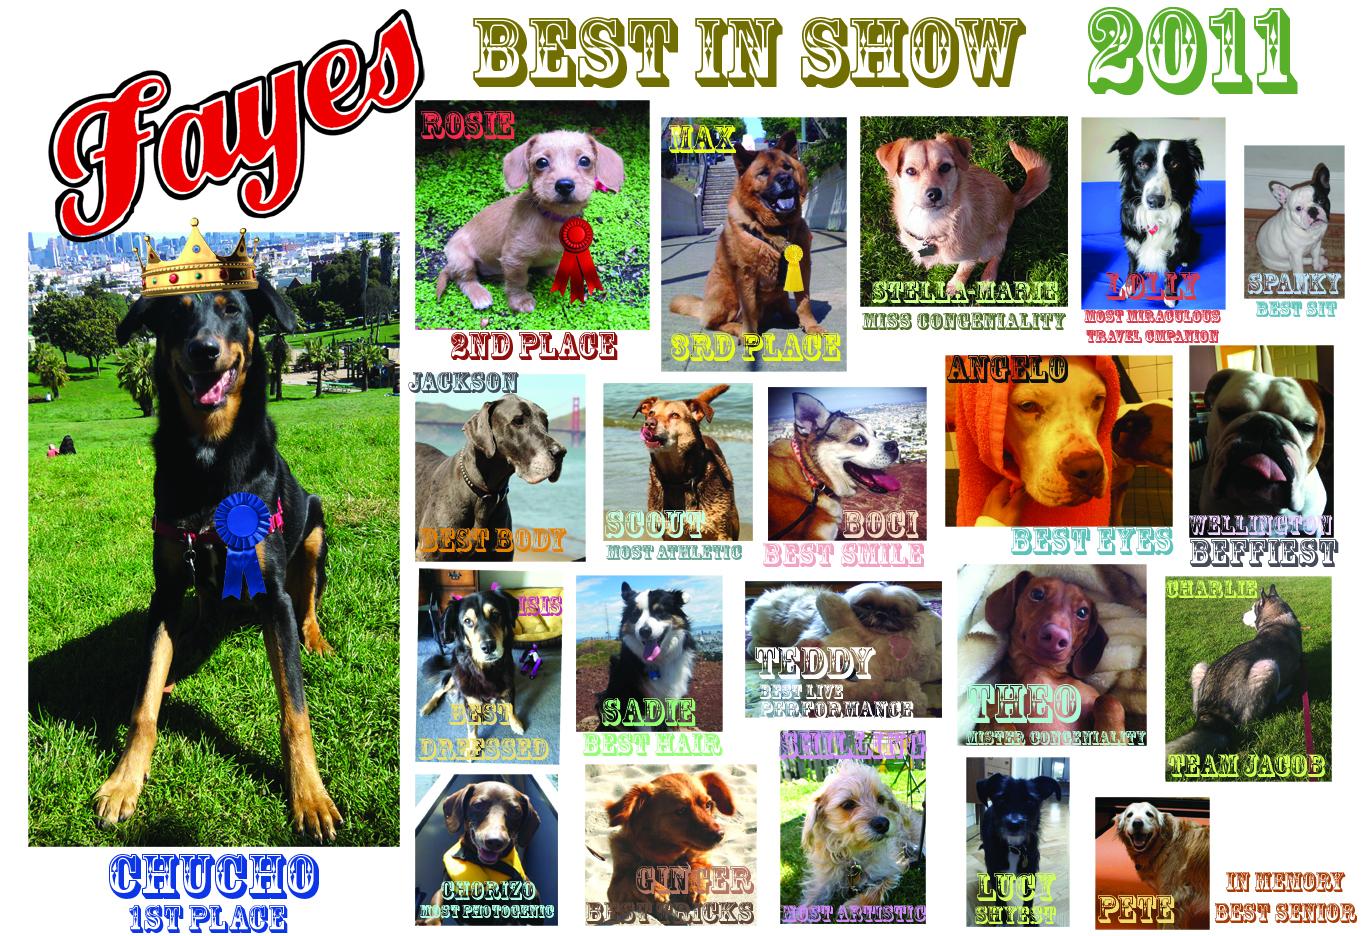 http://2.bp.blogspot.com/-vBCEkOefXgM/TewgAM_xuFI/AAAAAAAAAYM/C_6QOhGHPoU/s1600/best+in+show+2011web.jpg